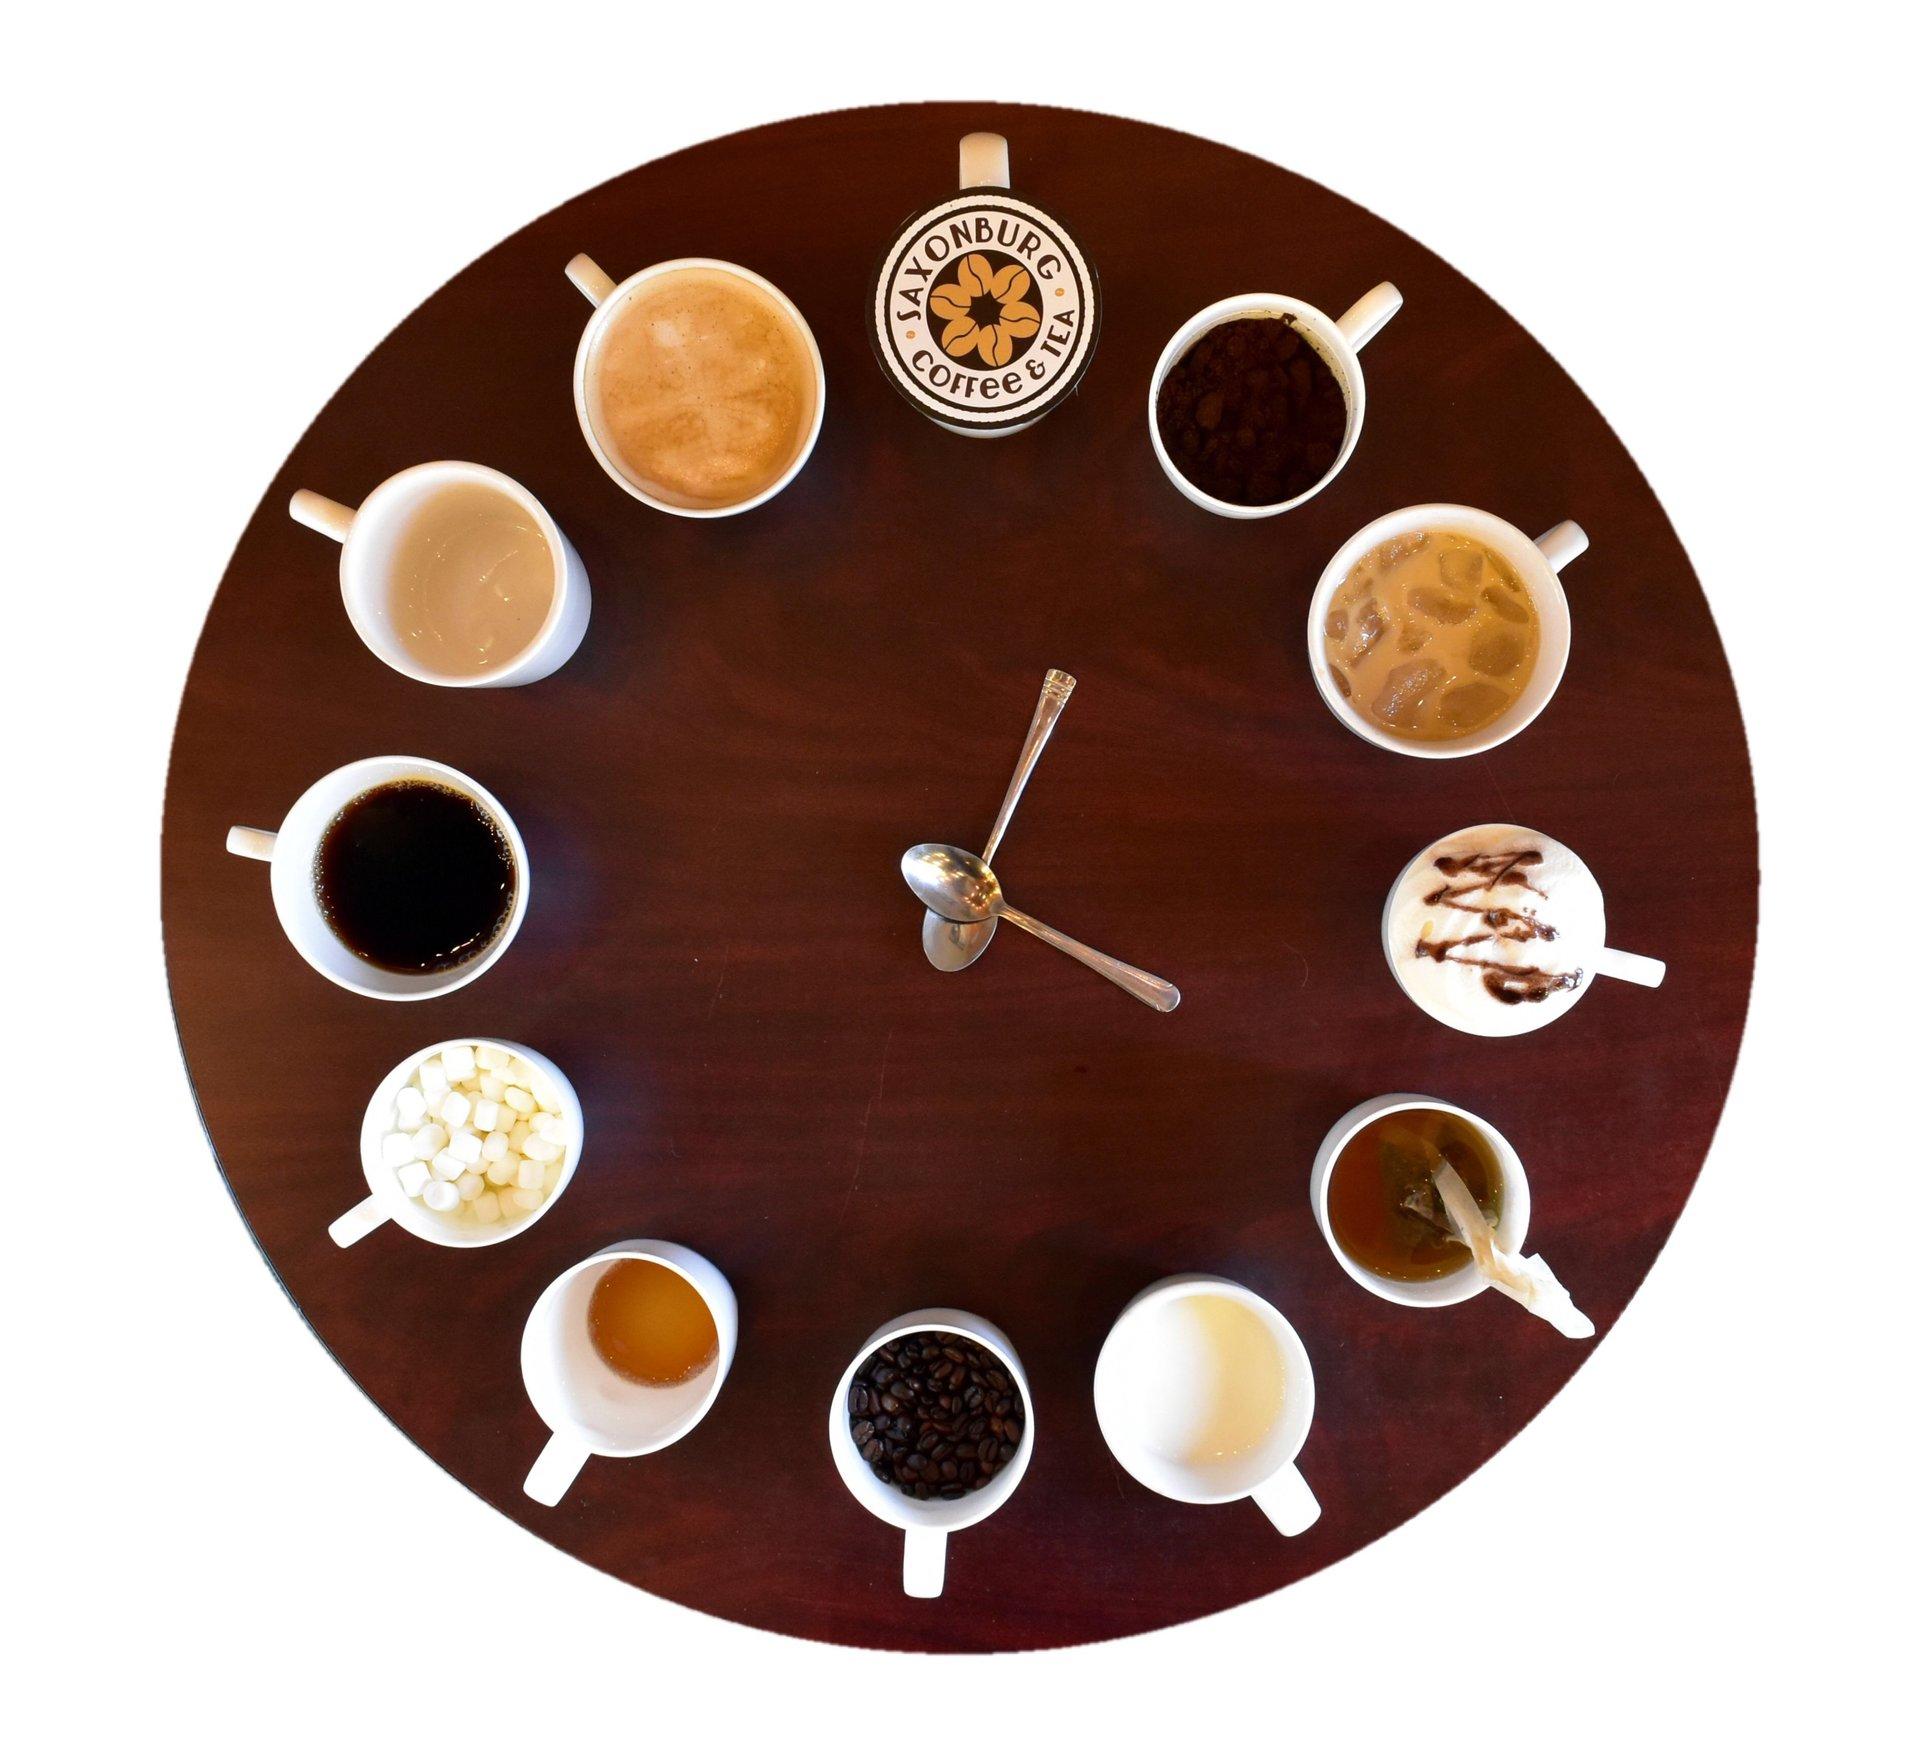 Saxonburg Coffee & Tea image 5